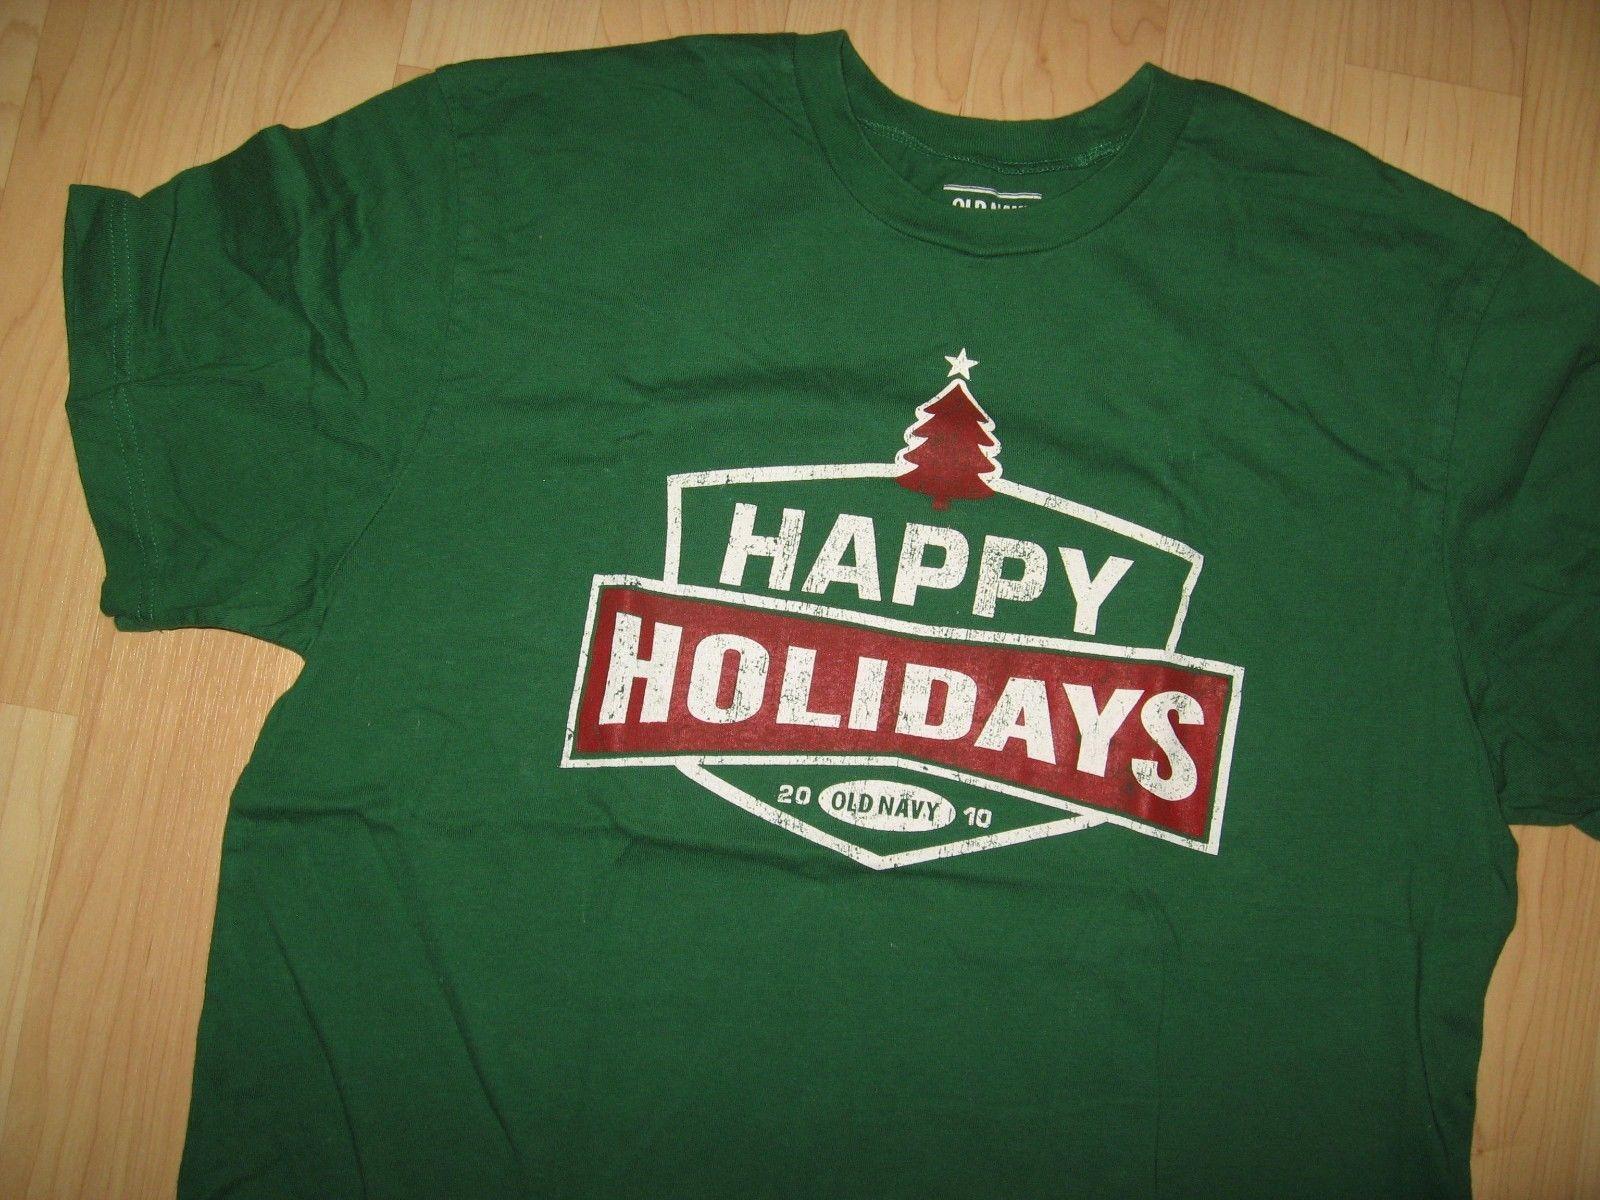 Old Navy Christmas T Shirts ✓ Labzada T Shirt